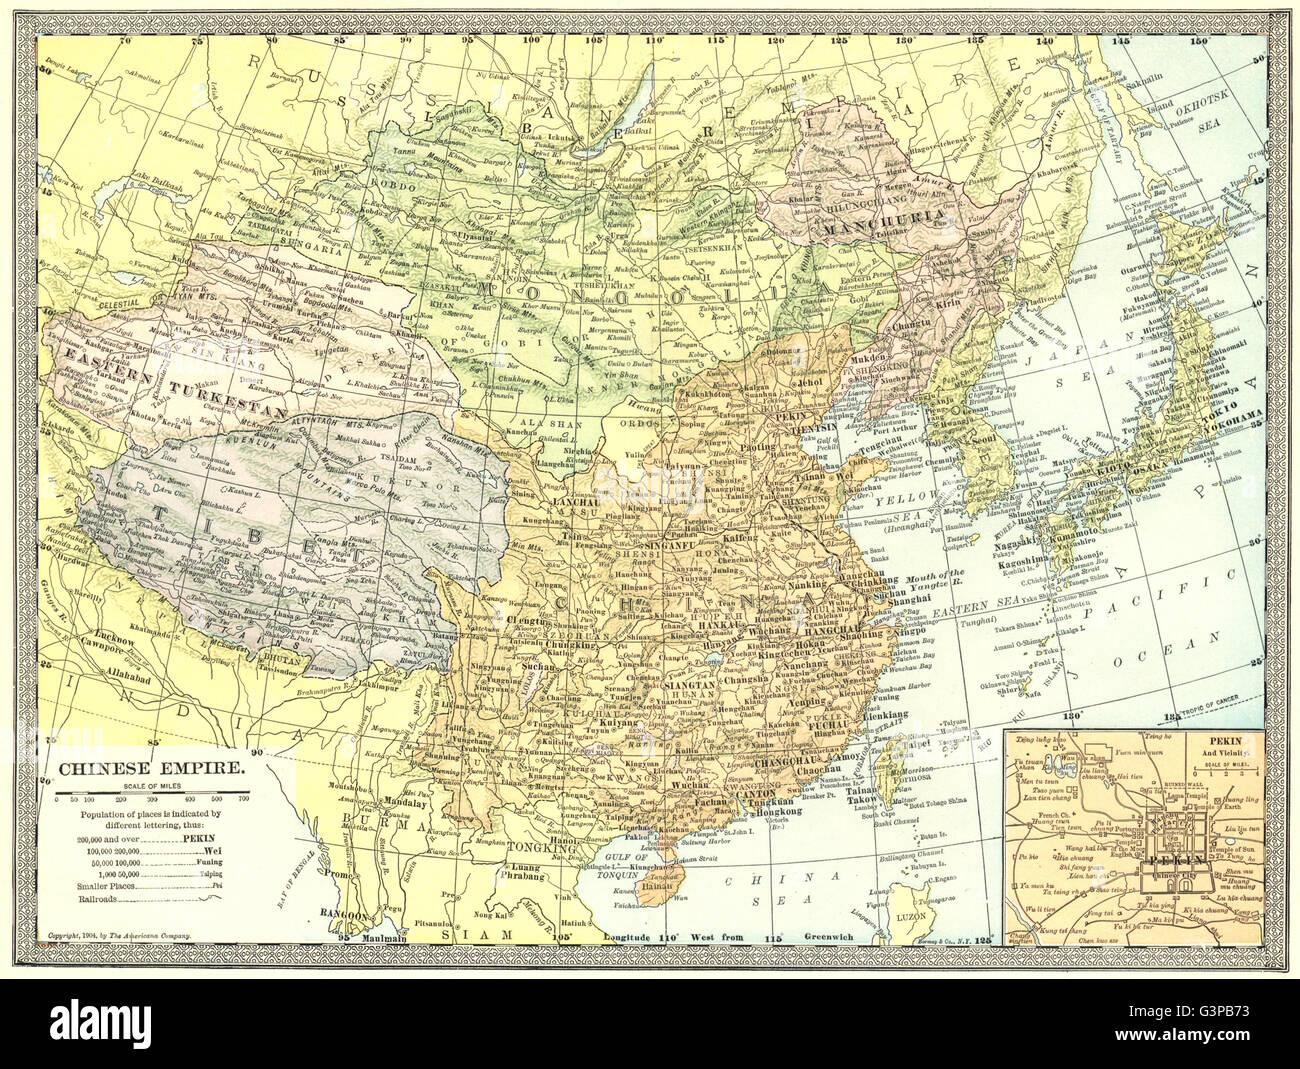 CHINESE EMPIRE. Manchuria Eastern Turkestan Tibet. Peking/Beijing inset 1907 map - Stock Image